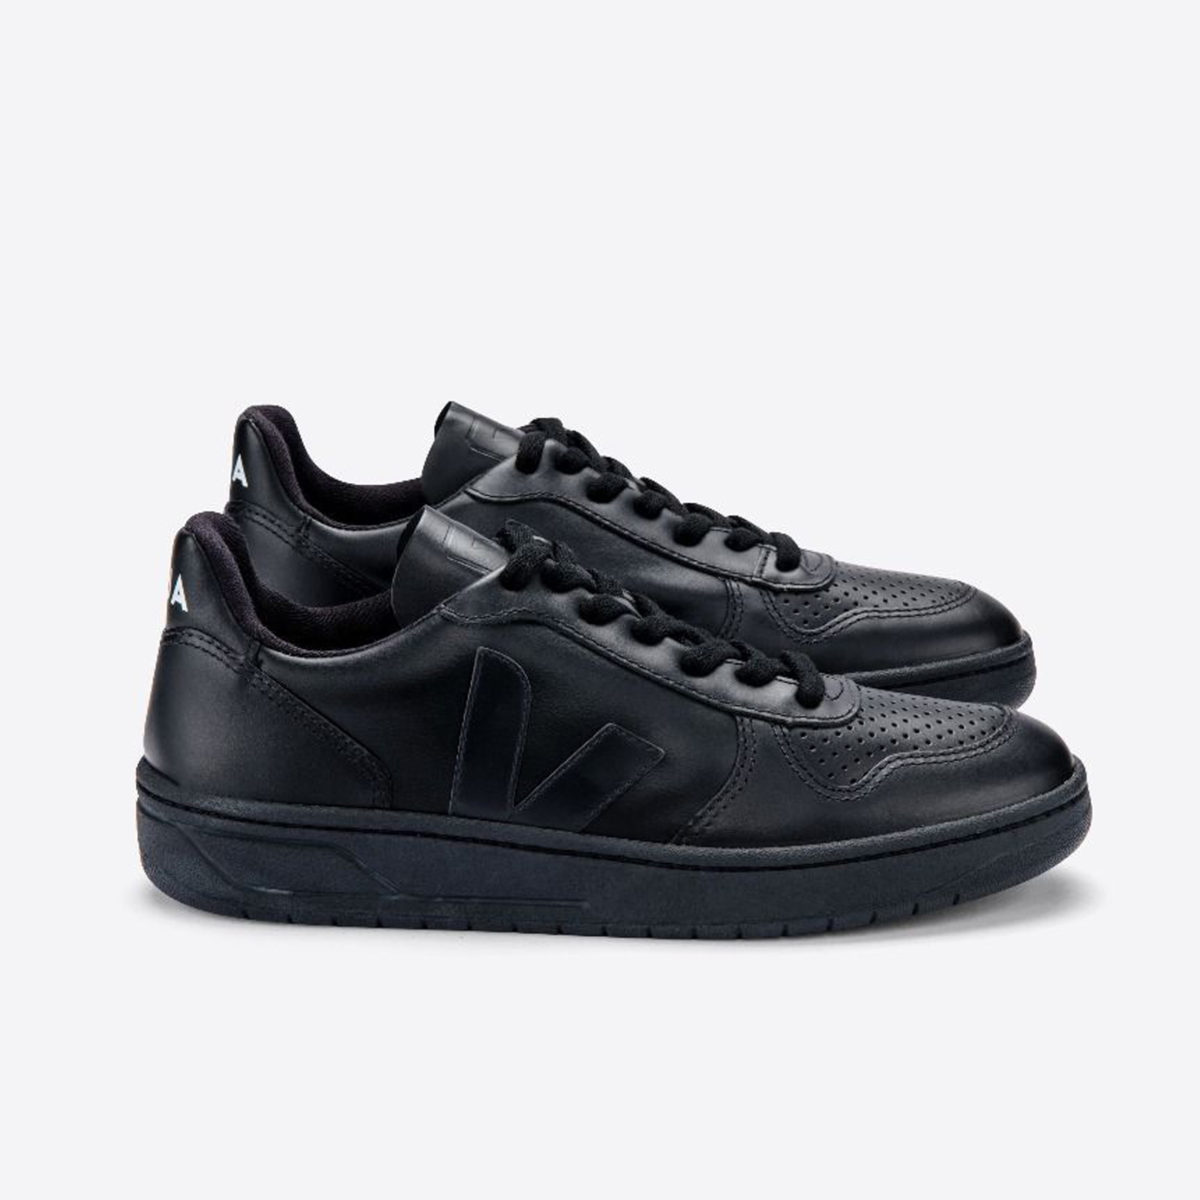 Vegansk sneaker från VEJA